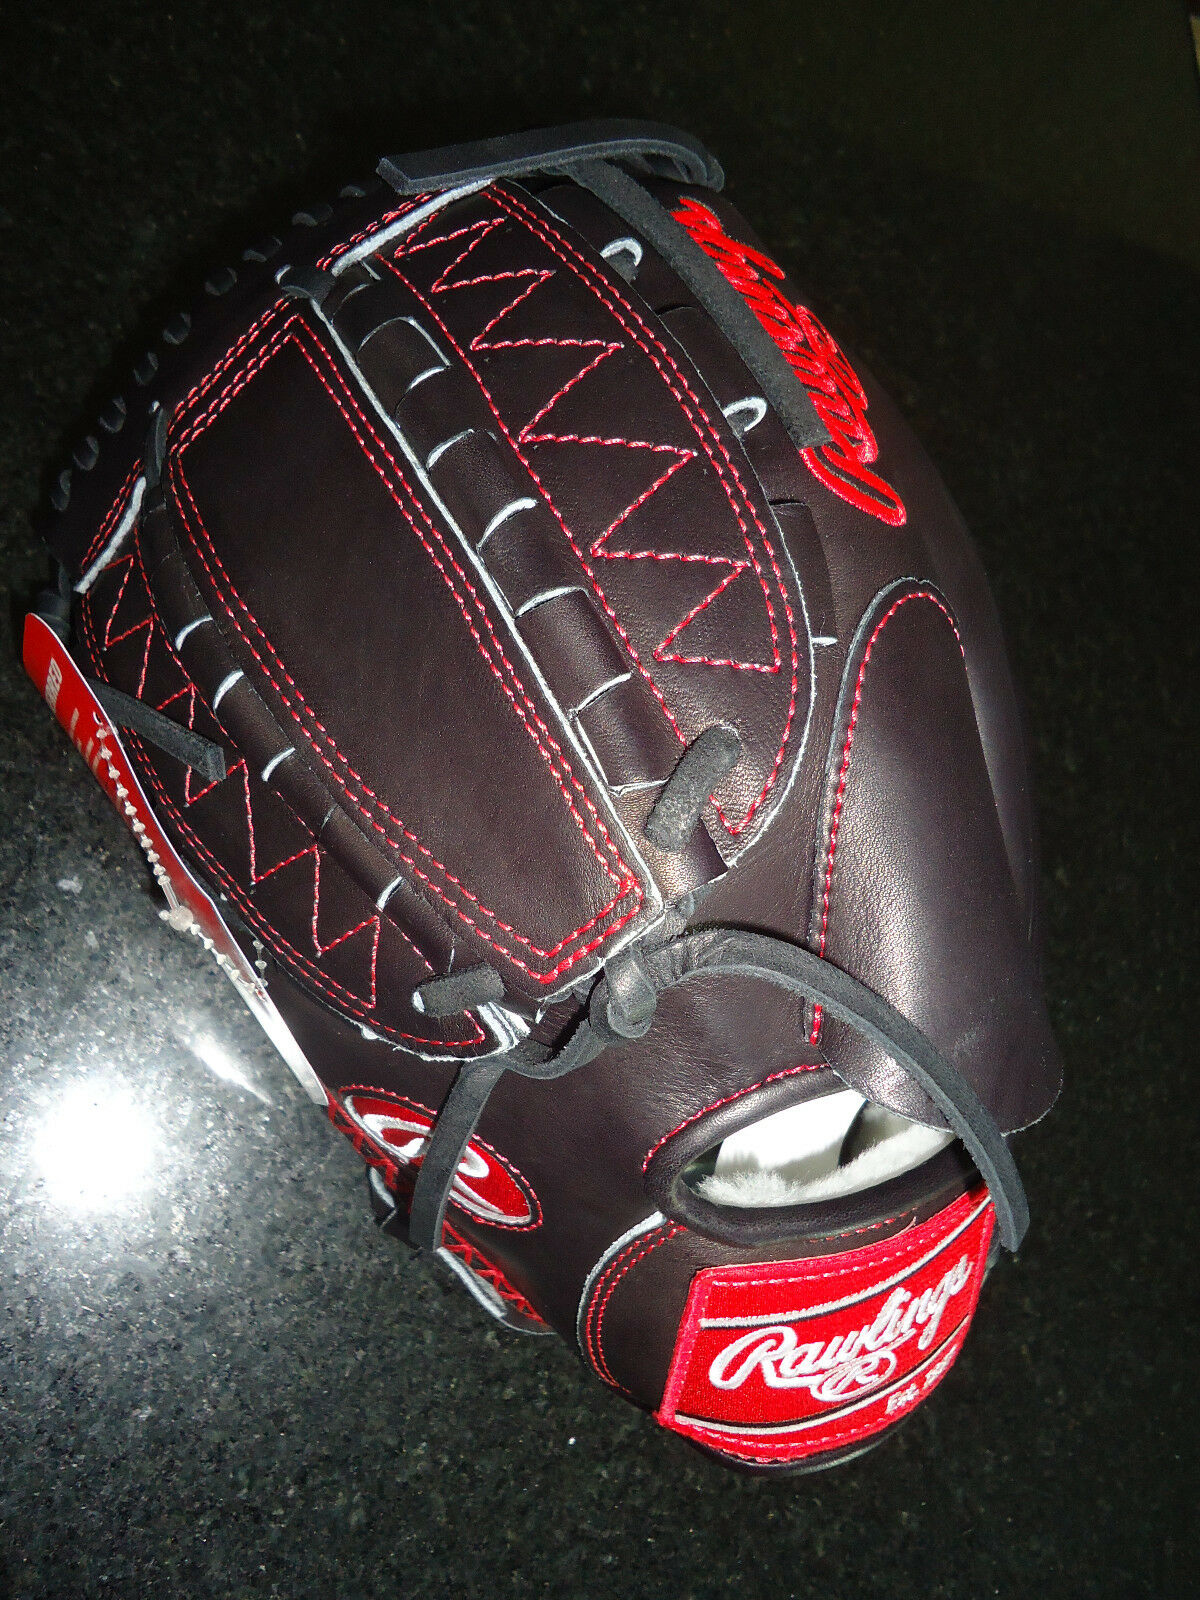 Rawlings Pro preferido 206-12B pros Guante de béisbol 12  LH  359.99